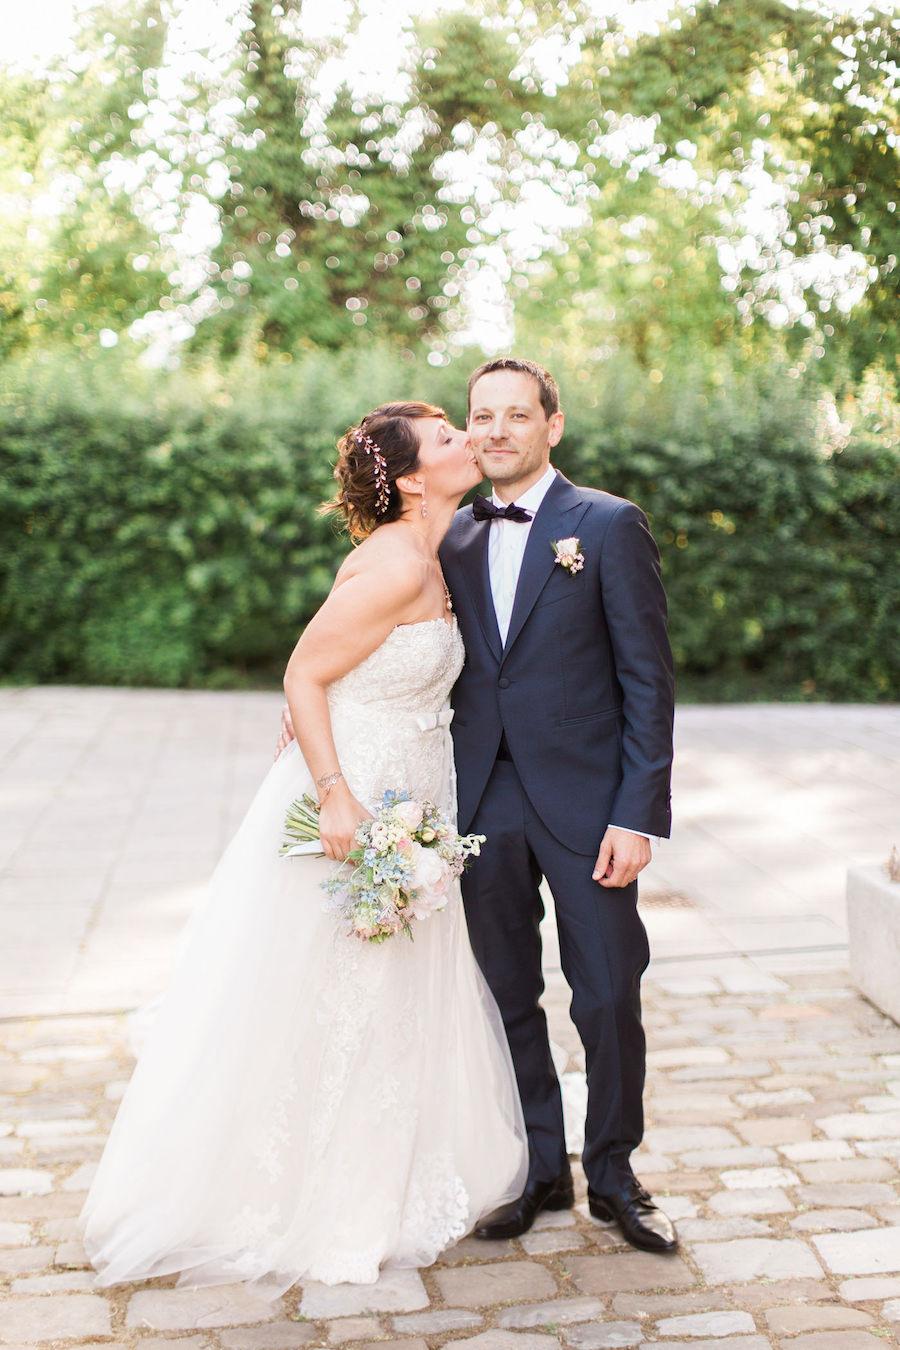 matrimonio geometrico colori pastello